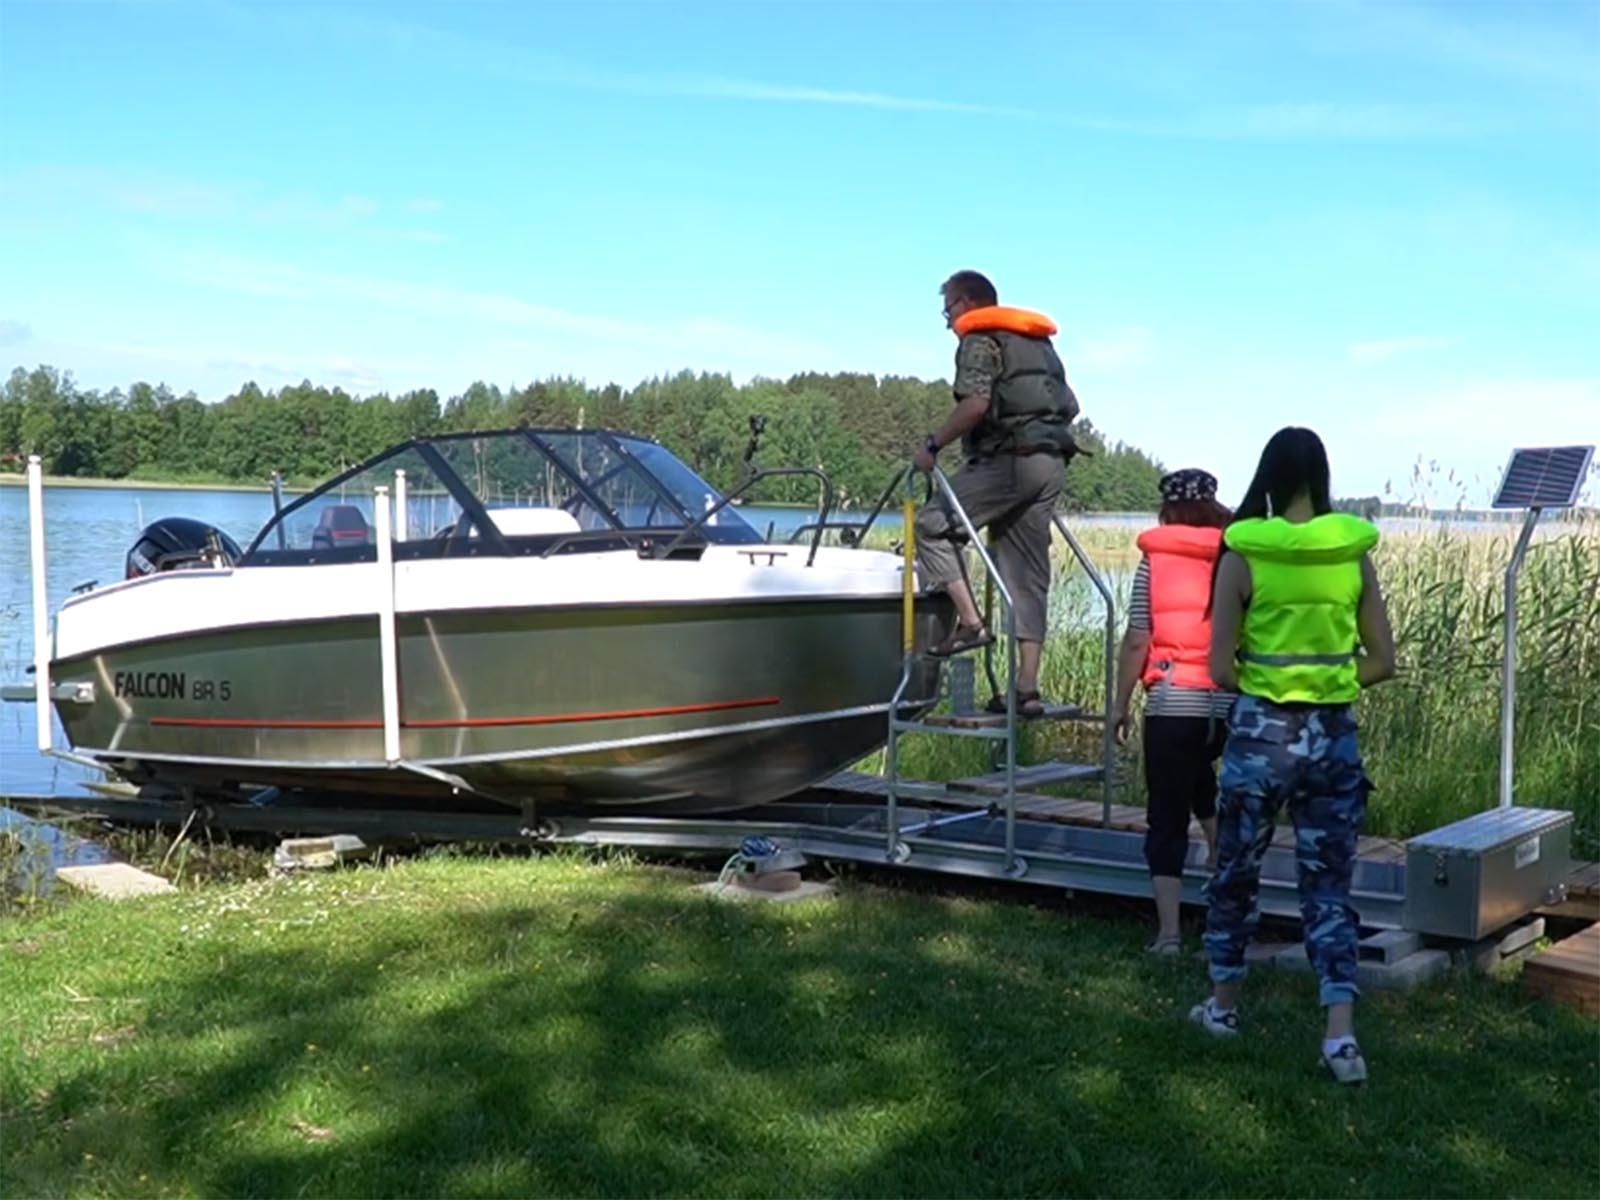 Easier boating with EasyBoatRoller